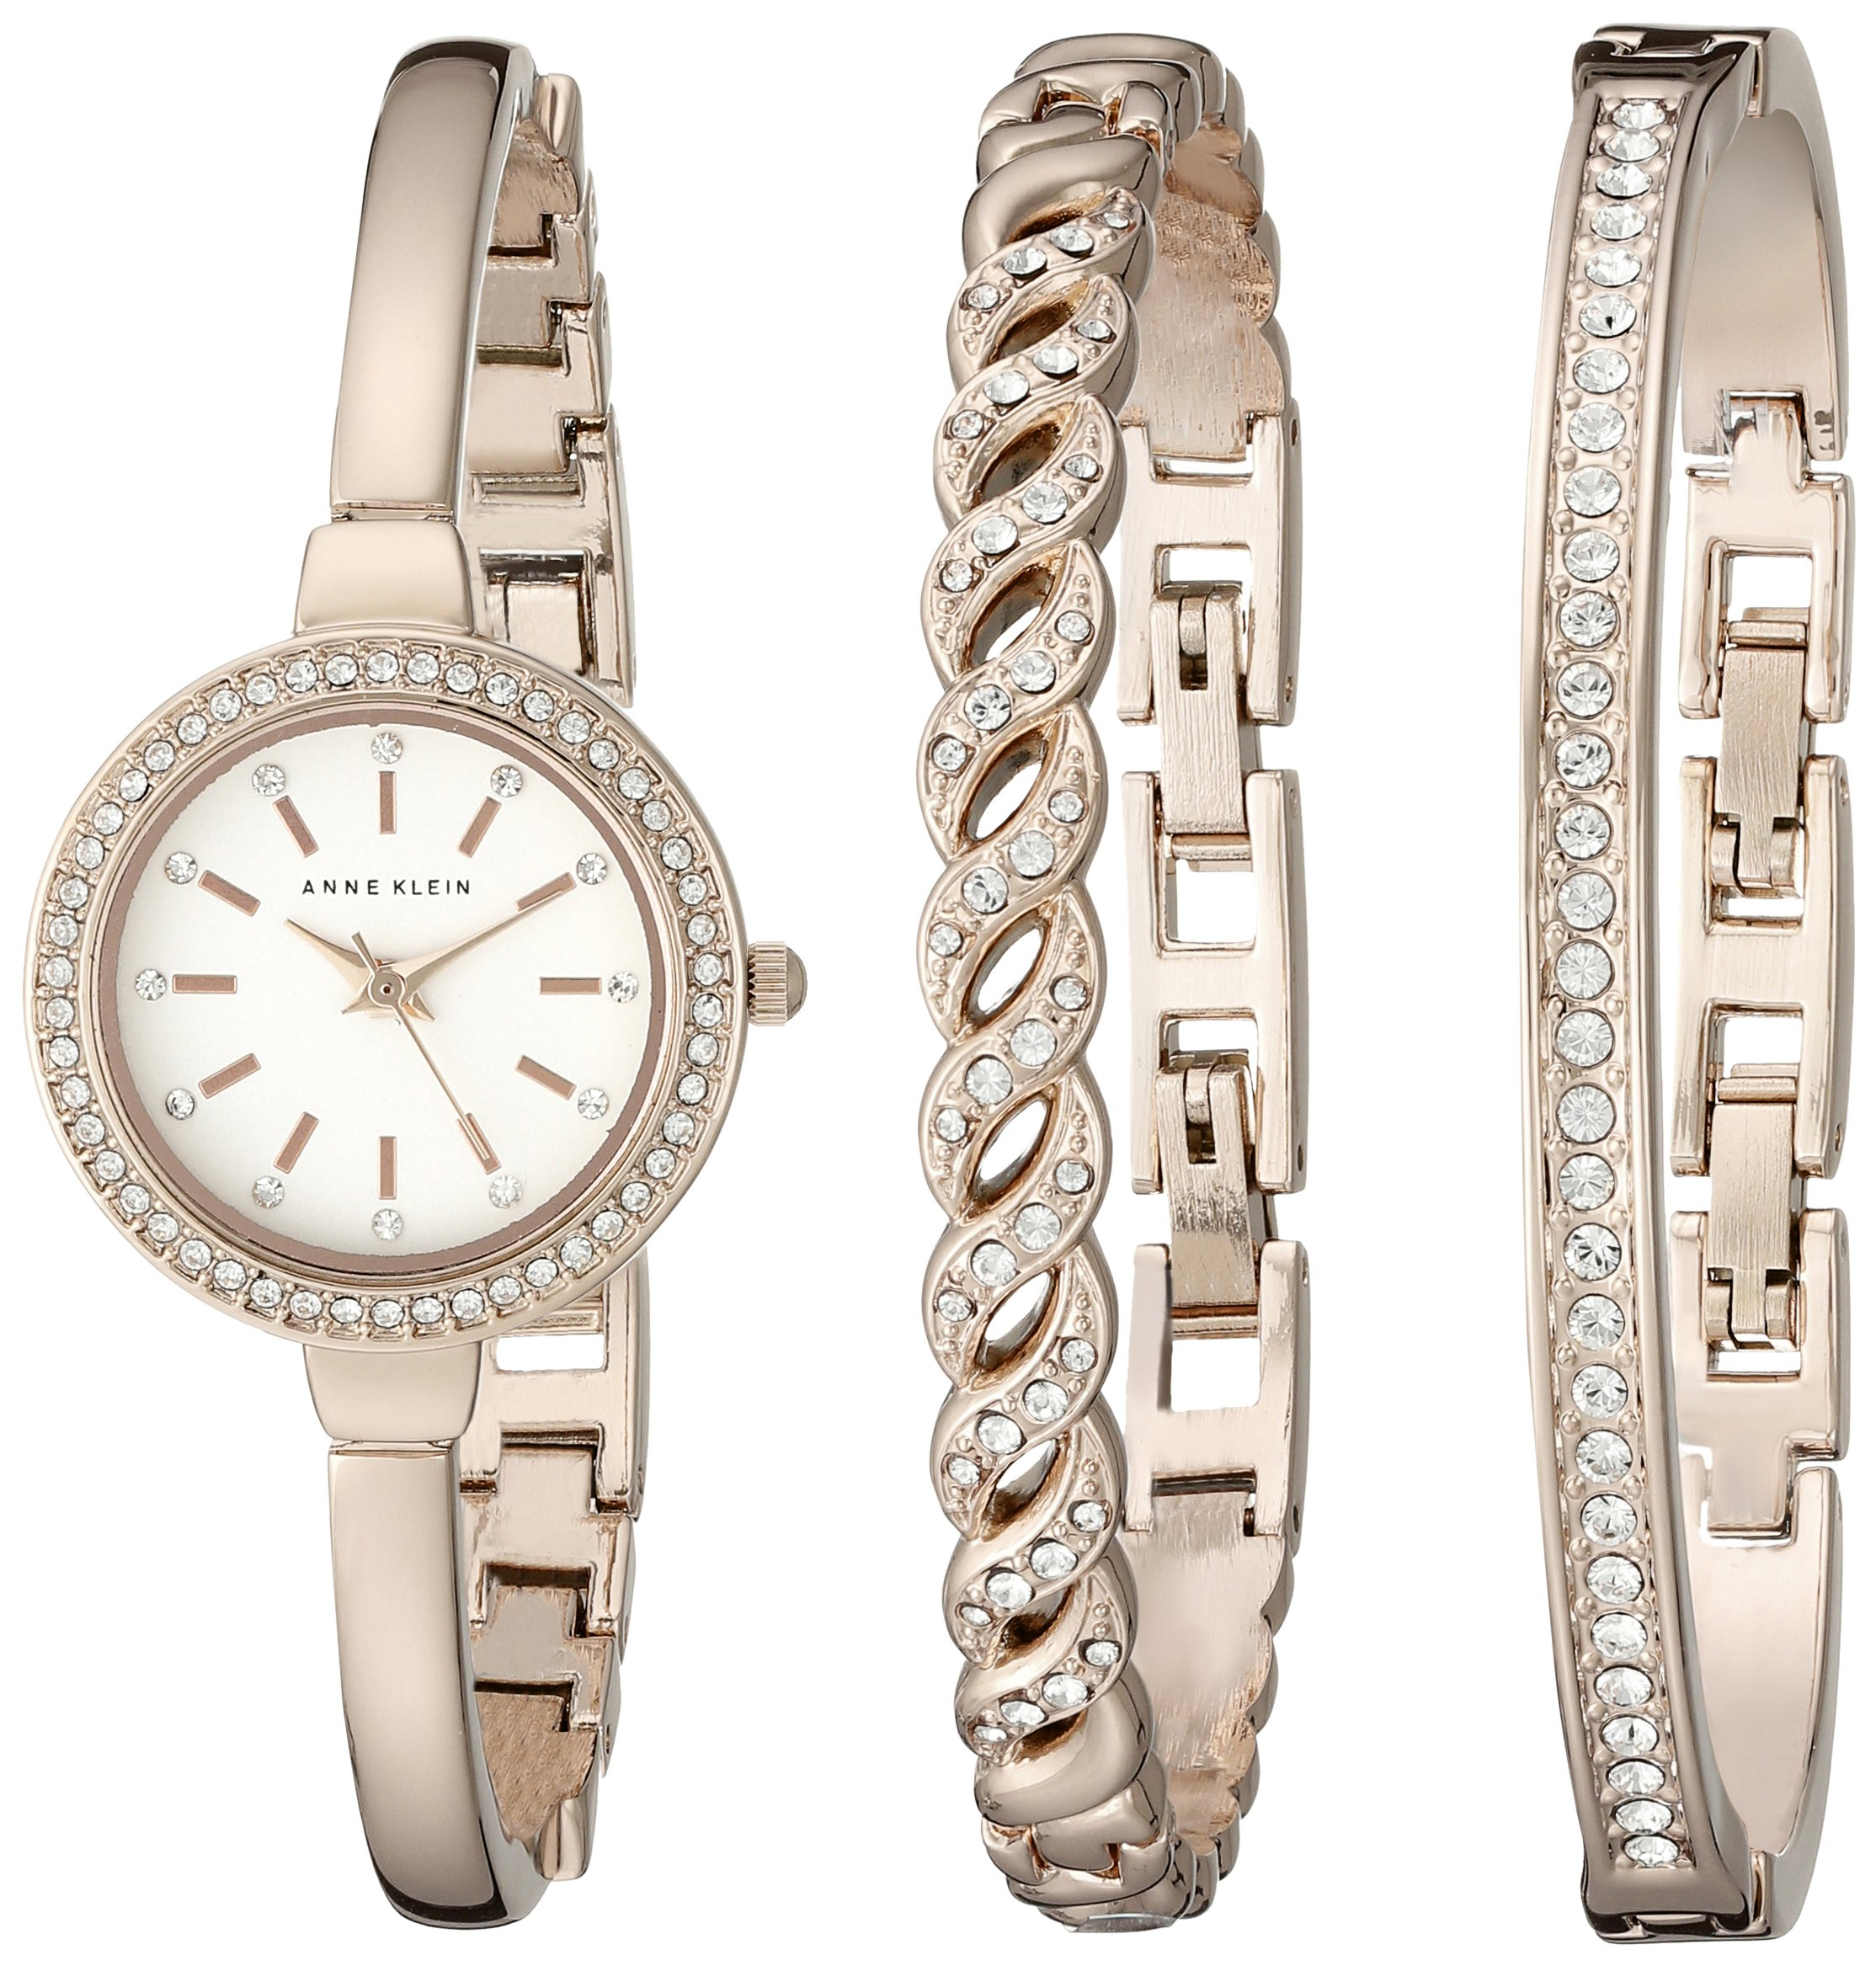 Anne Klein Women's AK/2046RGST Swarovski Crystal Accented Rose Gold-Tone Bangle Watch and Bracelet Set